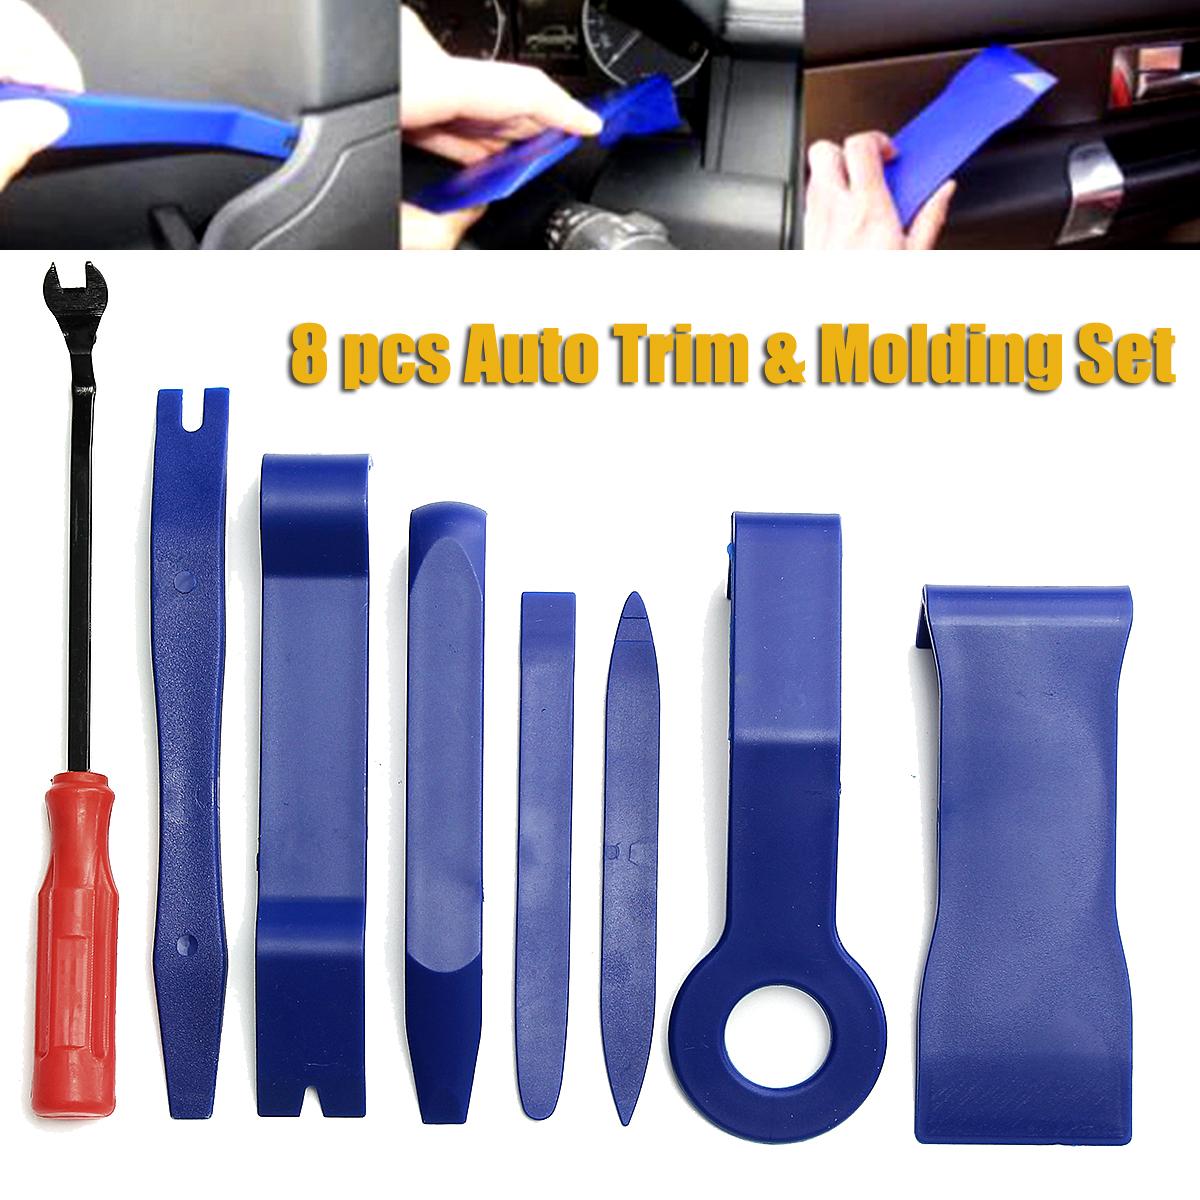 8 Pcs Auto Trim & Molding Set Nylon Car Interior/Exterior Handy Remover Pry Bars